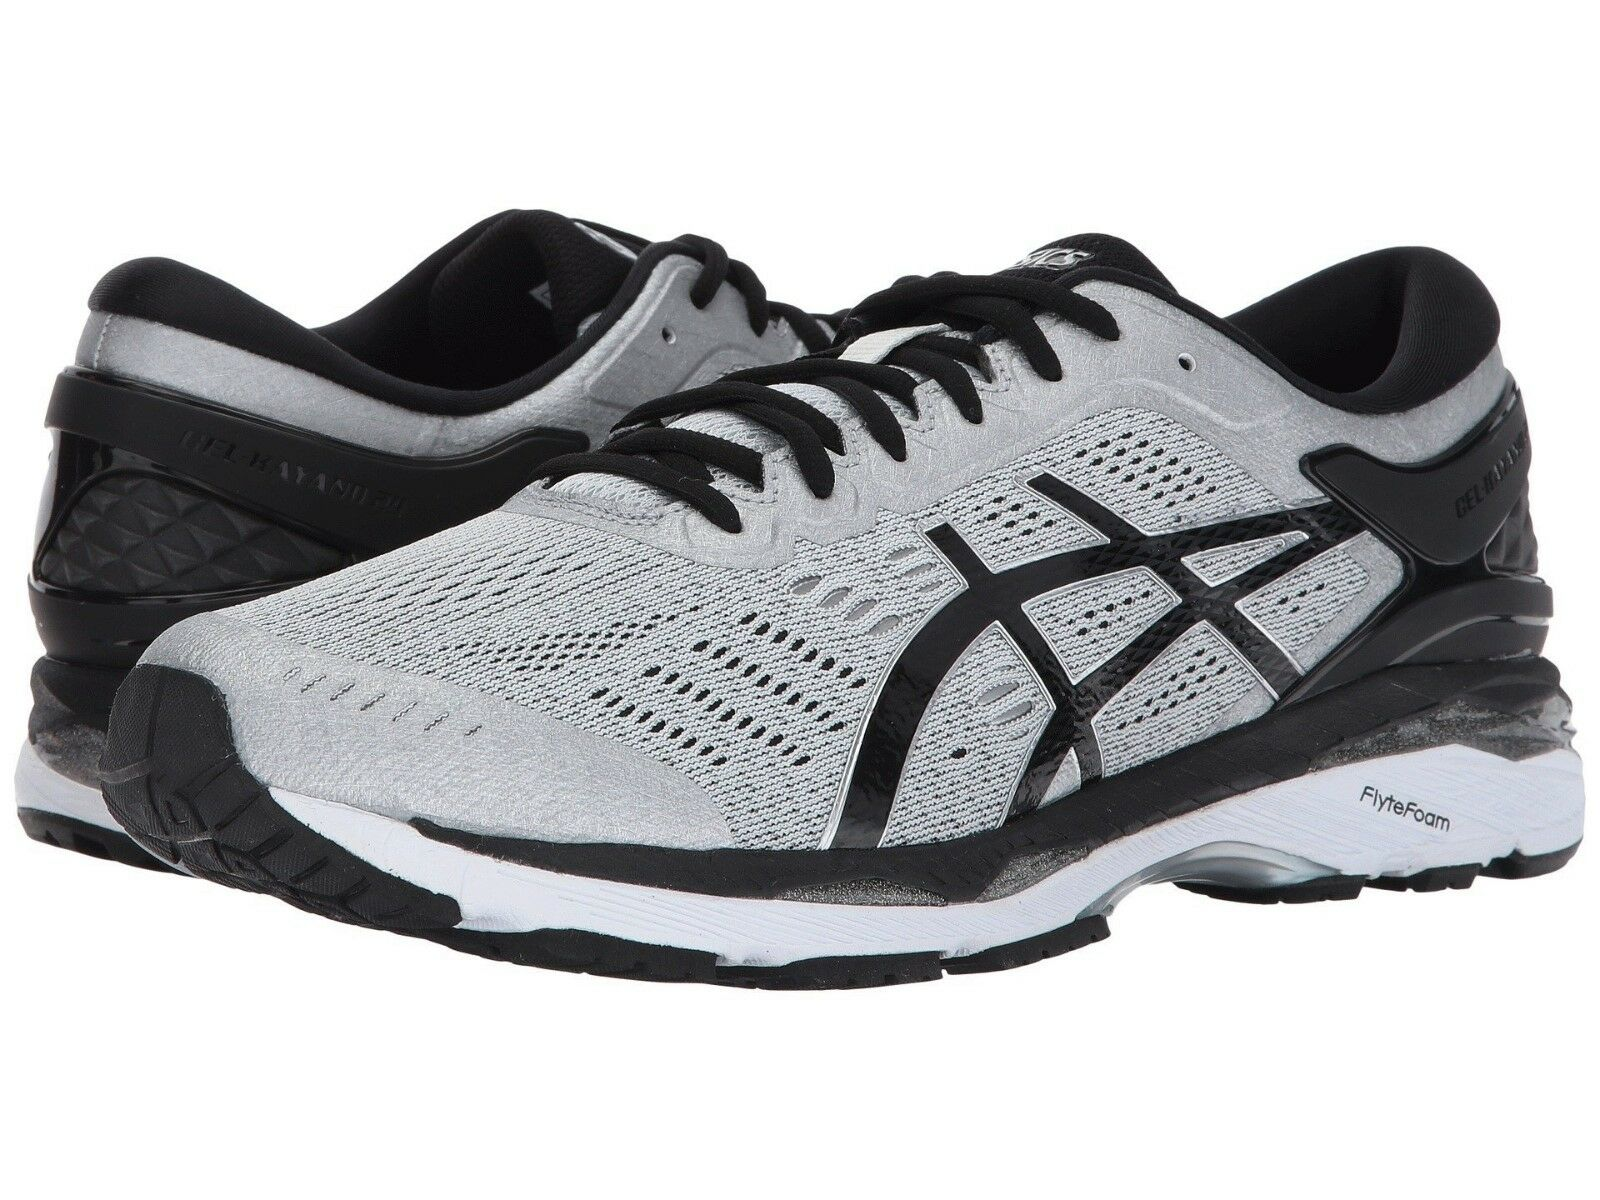 Nuova Uomo asic gel-kayano scarpe 24 corsa / formazione scarpe gel-kayano - 8, 2e / largo 160 155db1